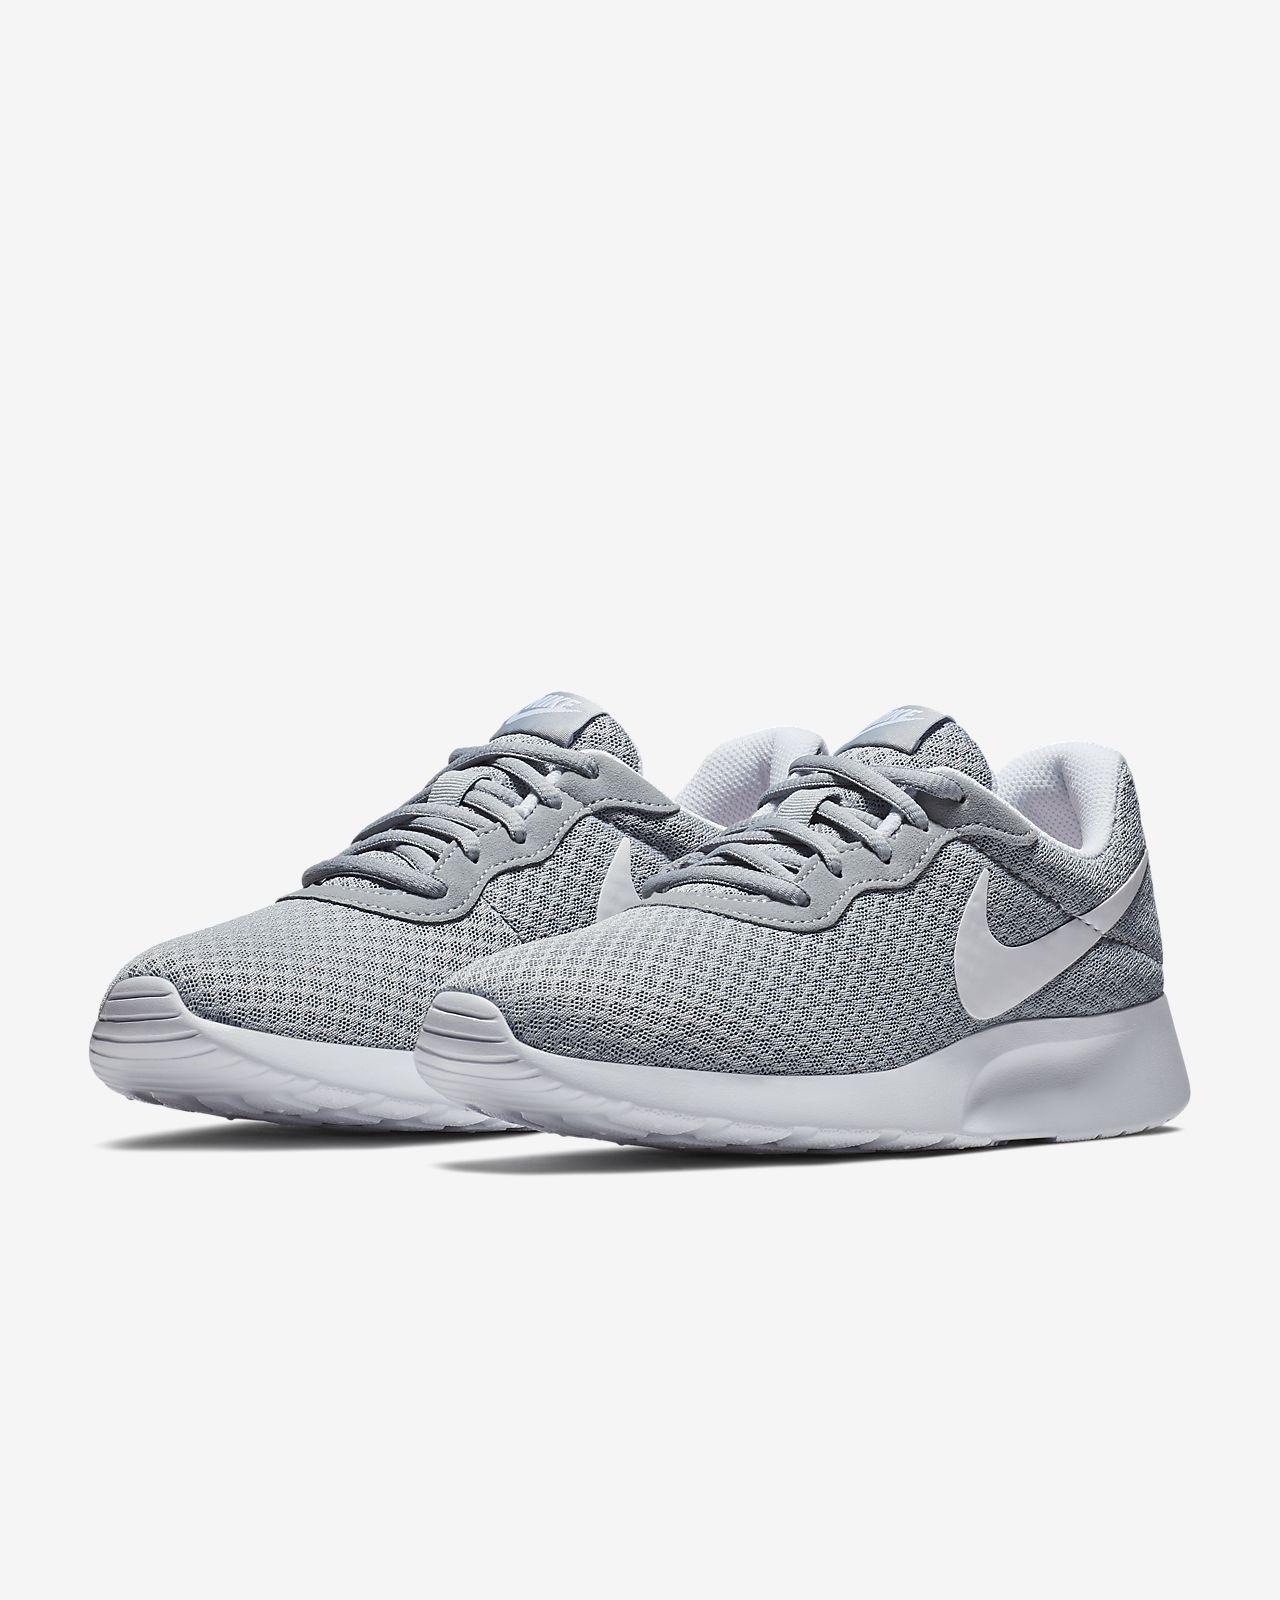 843ea269fc Low Resolution Nike Tanjun női cipő Nike Tanjun női cipő